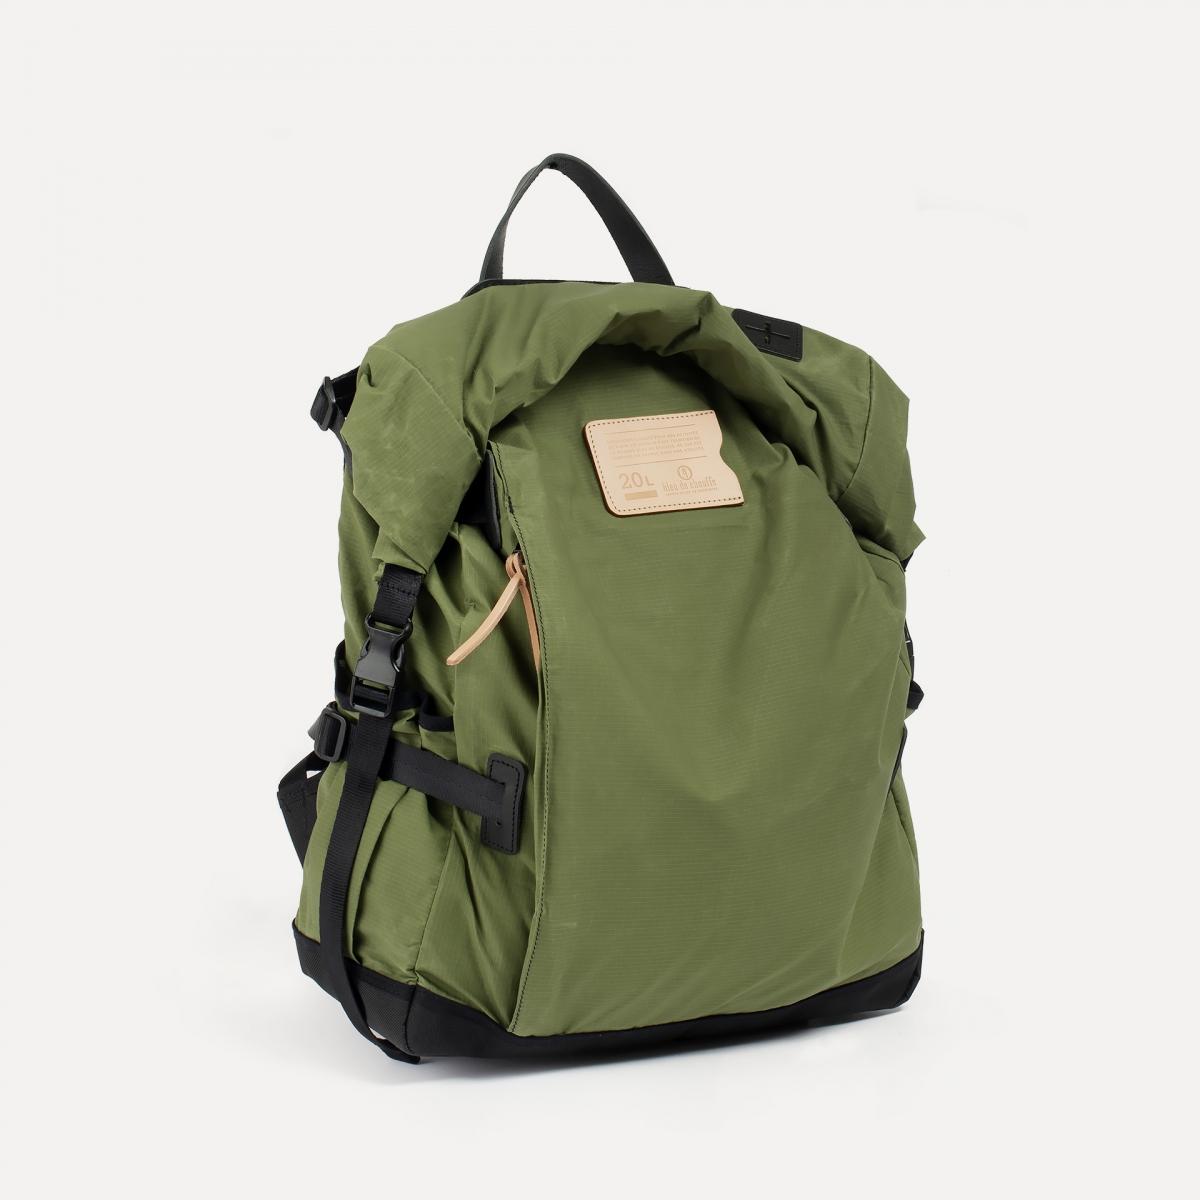 20L Basile Backpack - Bancha Green (image n°2)